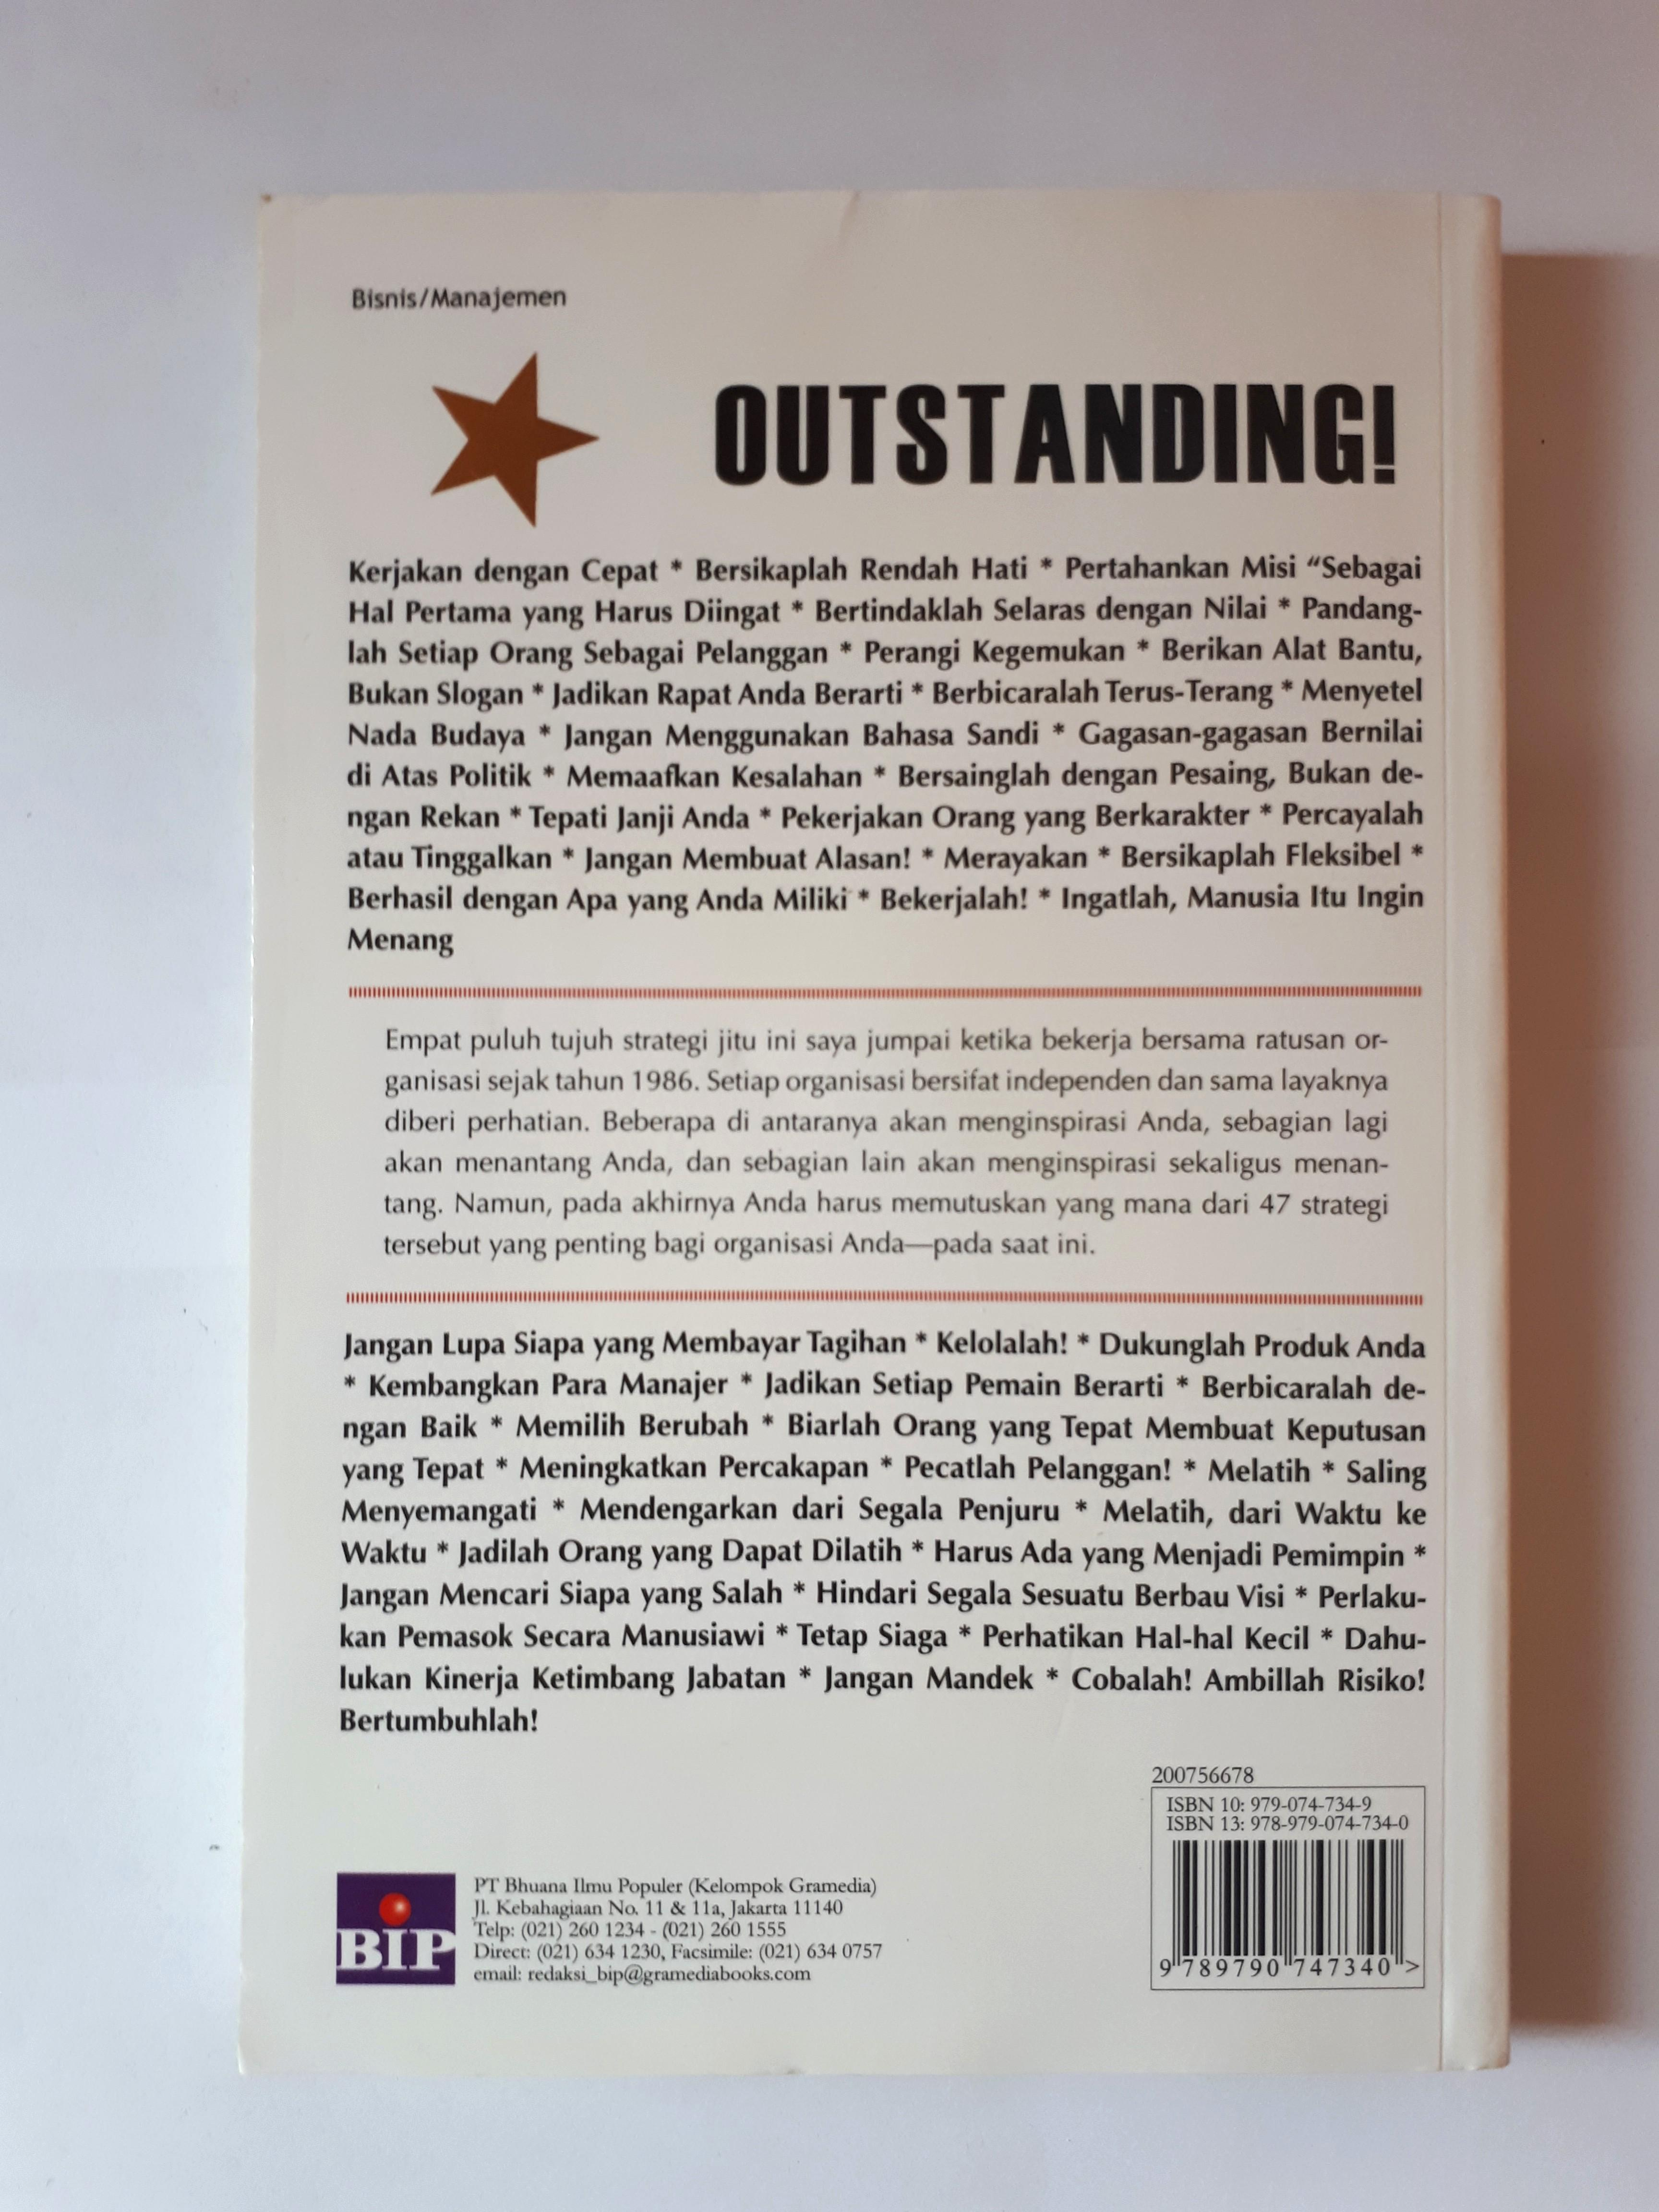 [Original] Buku Outstanding!, by John G Miller